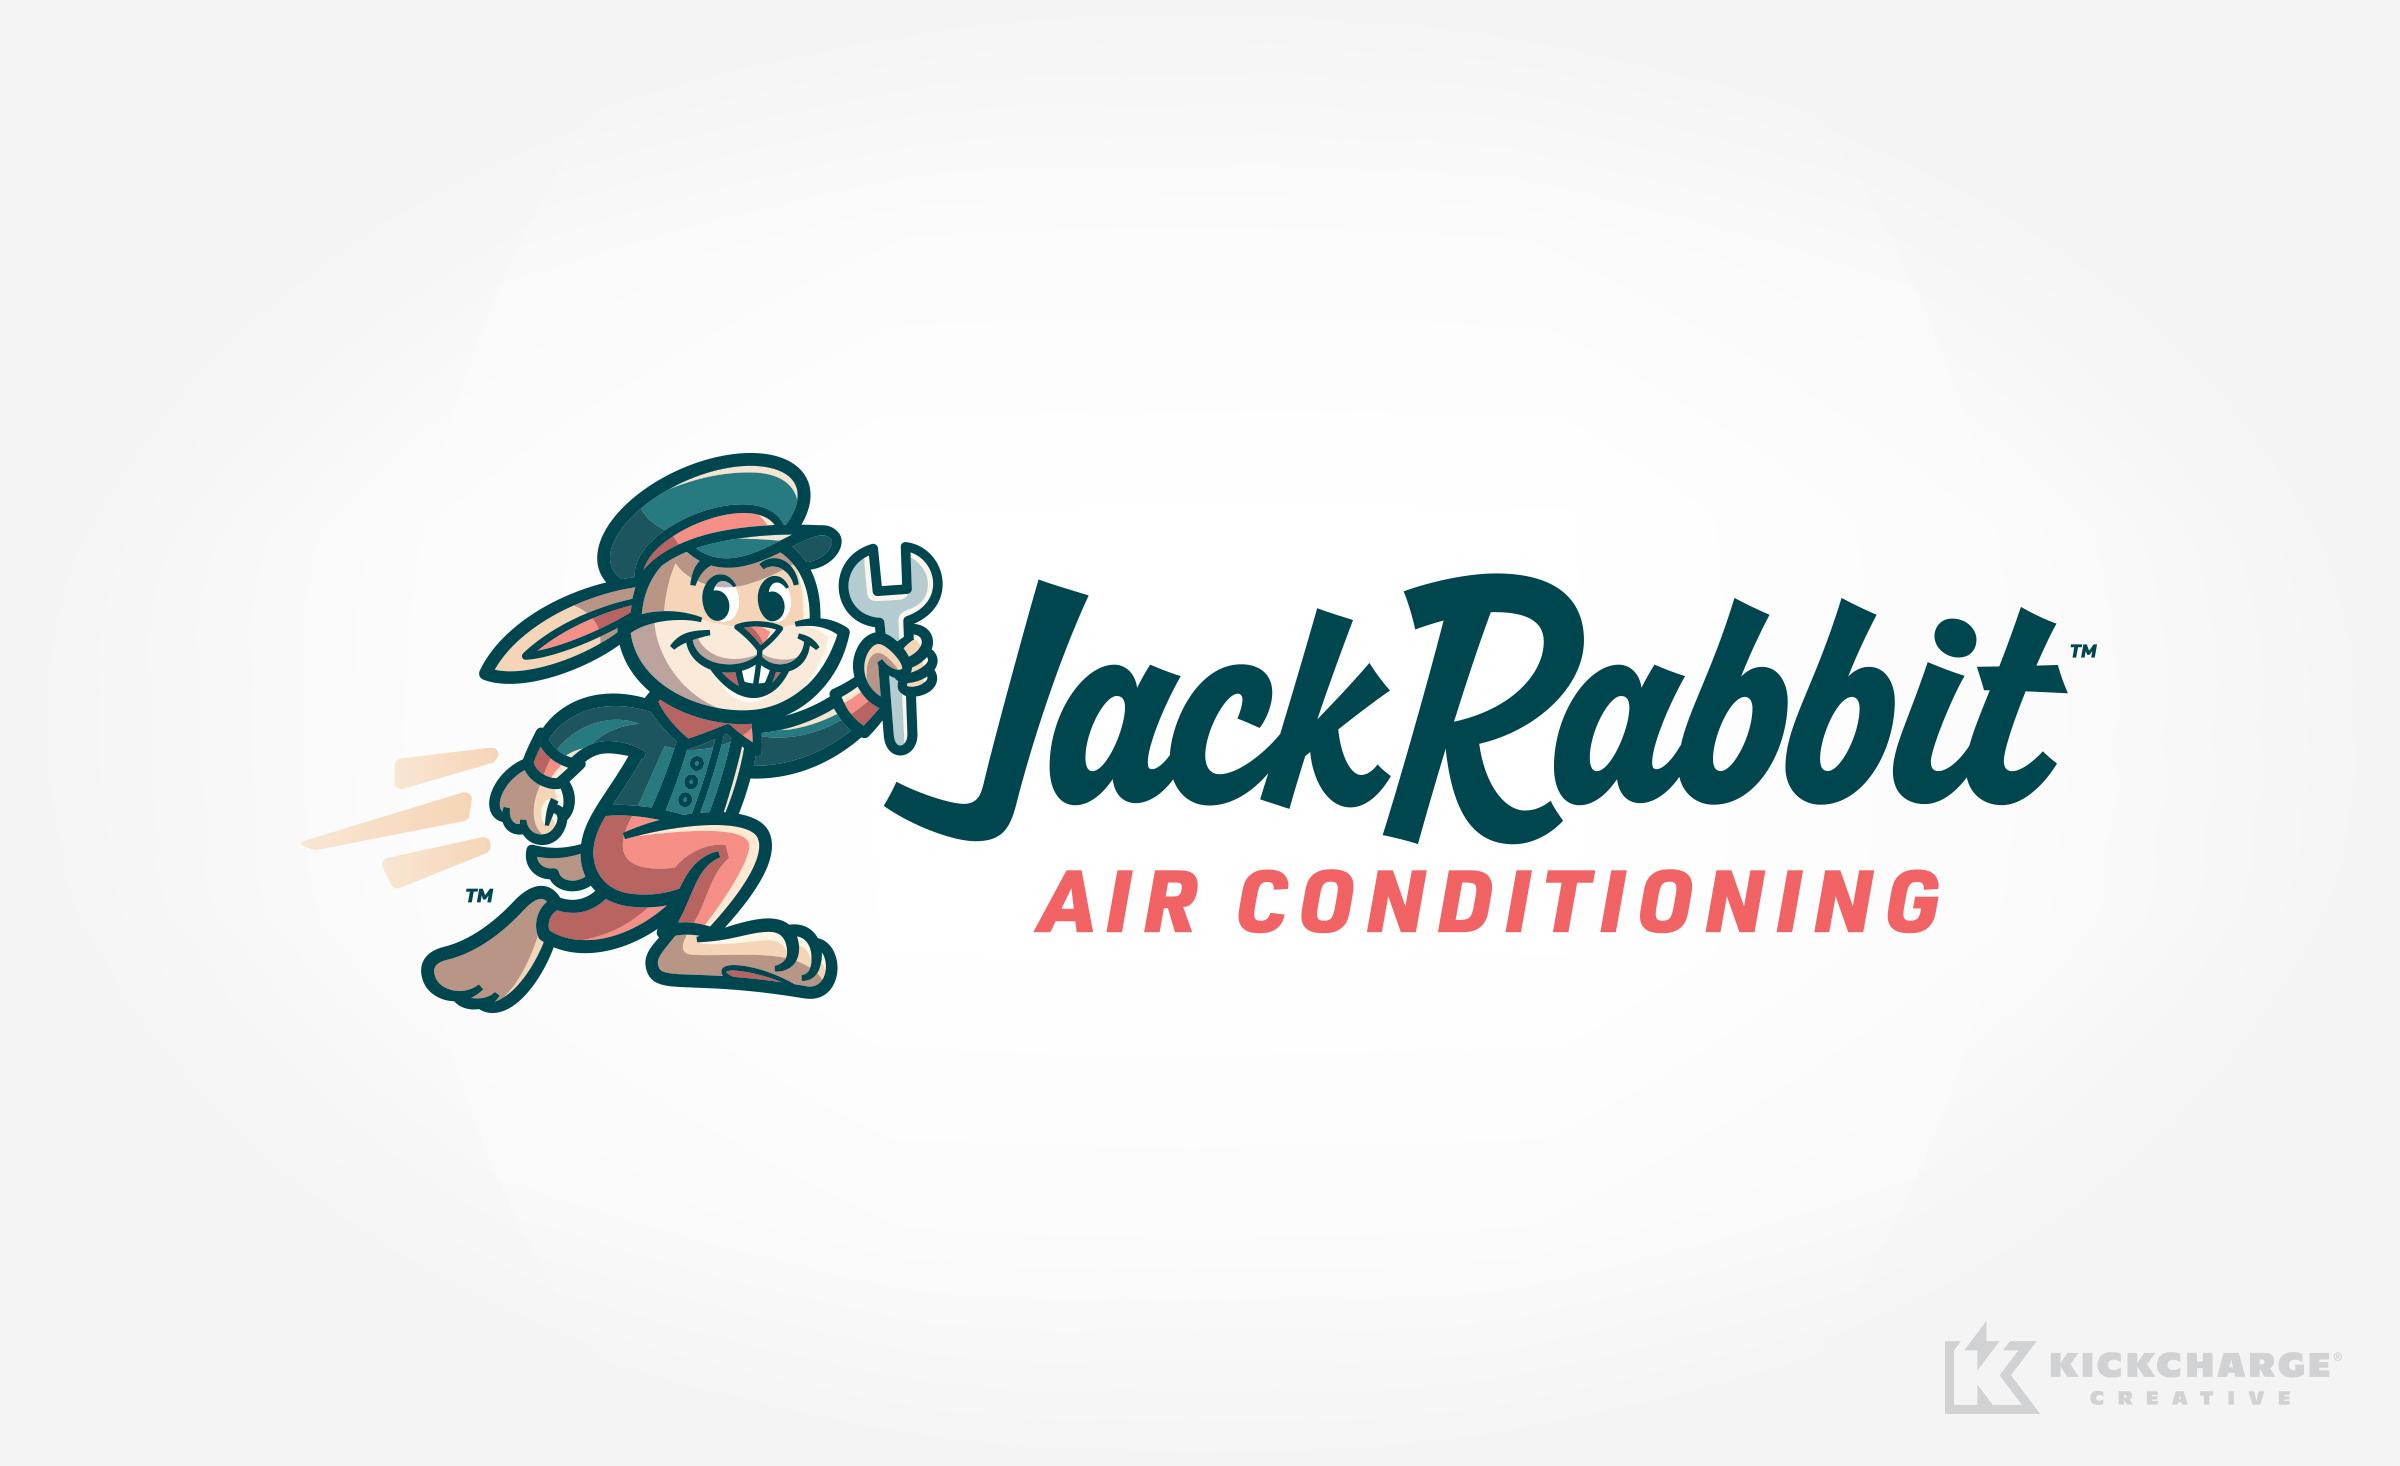 hvac logo for Jack Rabbit